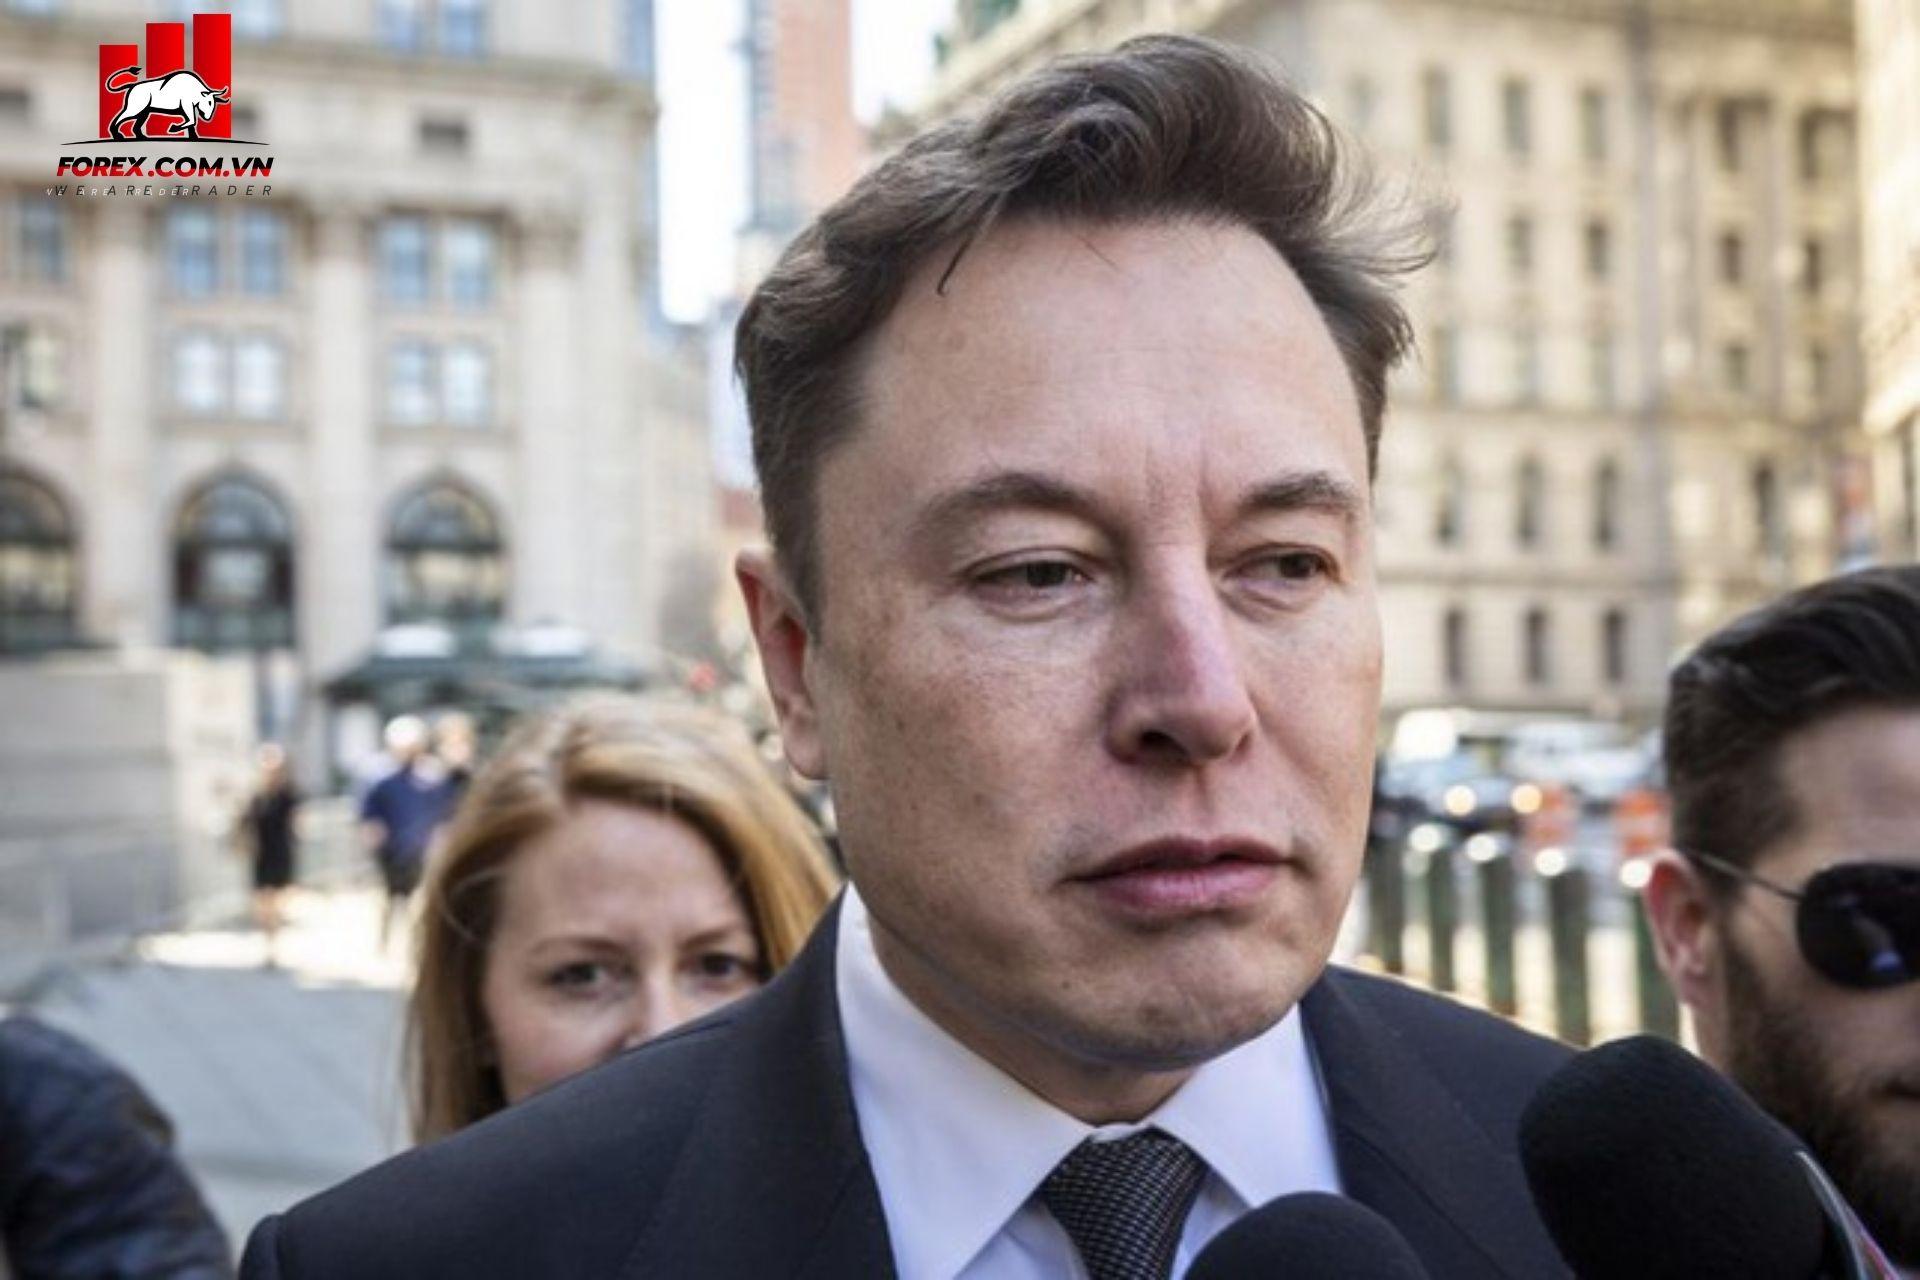 giam doc dieu hanh tesla Elon Musk